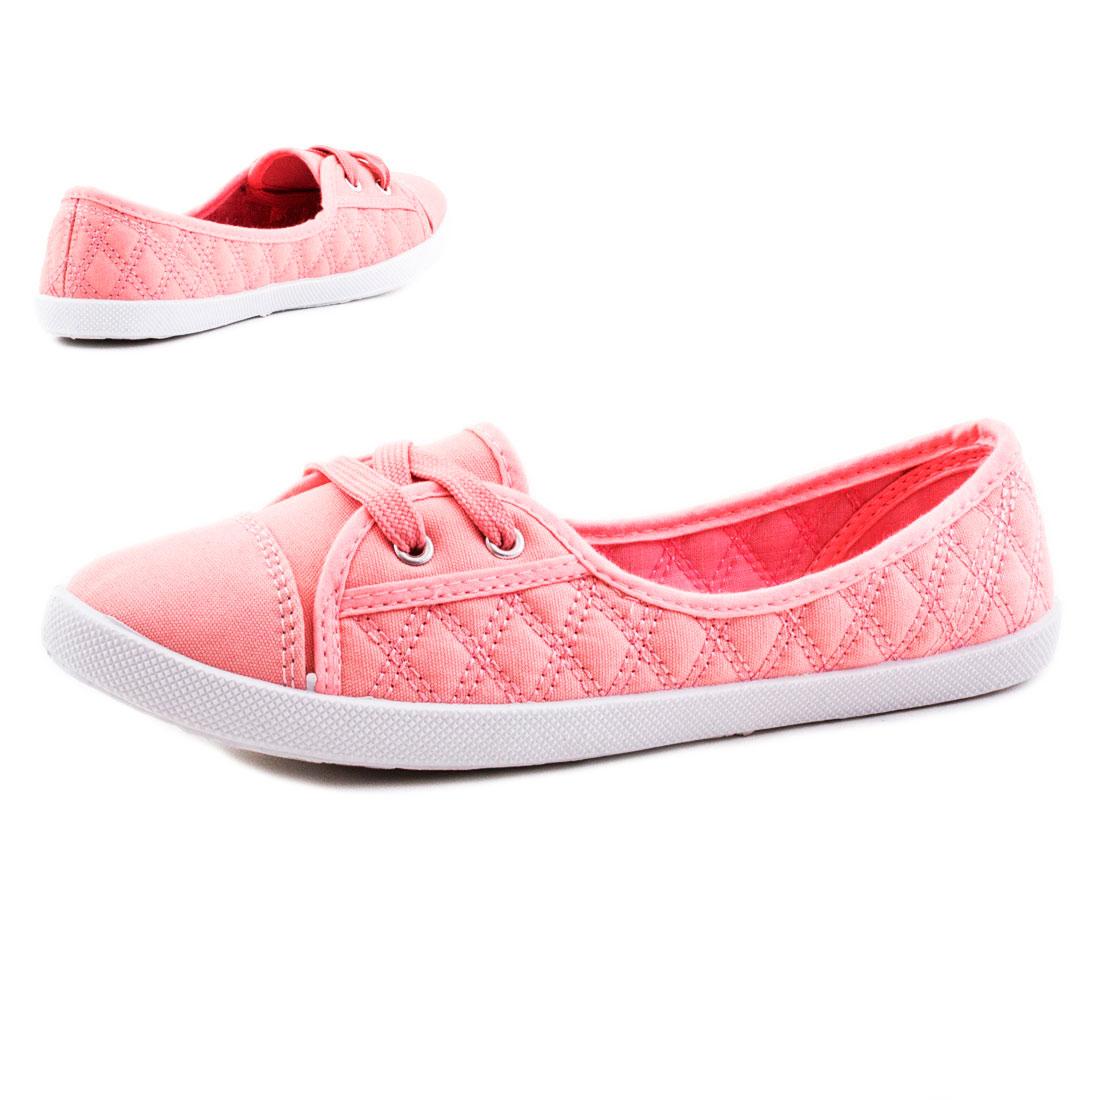 neu damen sommer schn r ballerinas schuhe sneaker wow gr 36 37 38 39 40 41. Black Bedroom Furniture Sets. Home Design Ideas